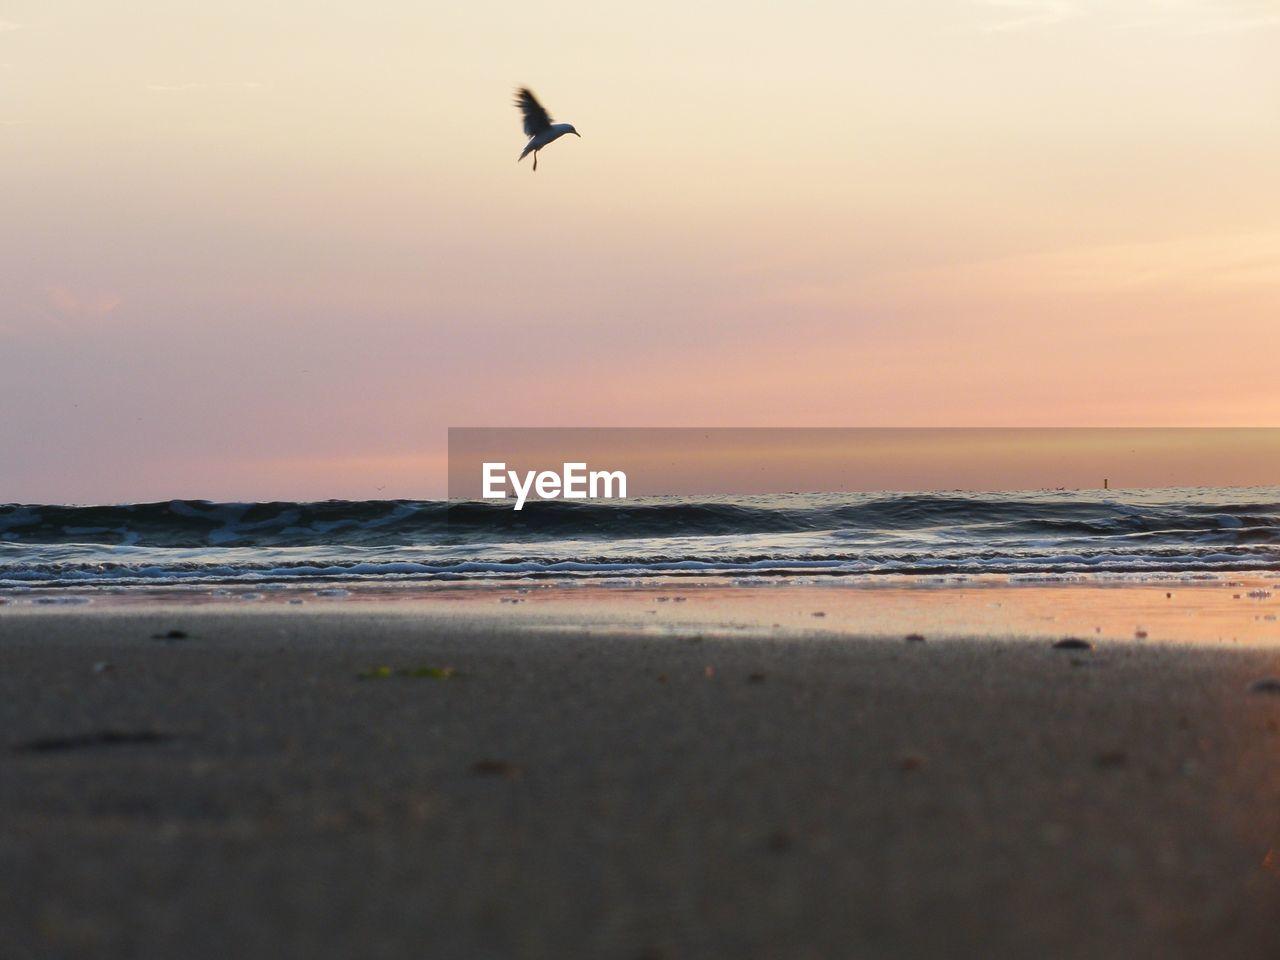 sea, animal themes, sunset, animal, beach, vertebrate, sky, bird, water, animals in the wild, land, animal wildlife, beauty in nature, flying, horizon over water, one animal, horizon, scenics - nature, wave, no people, outdoors